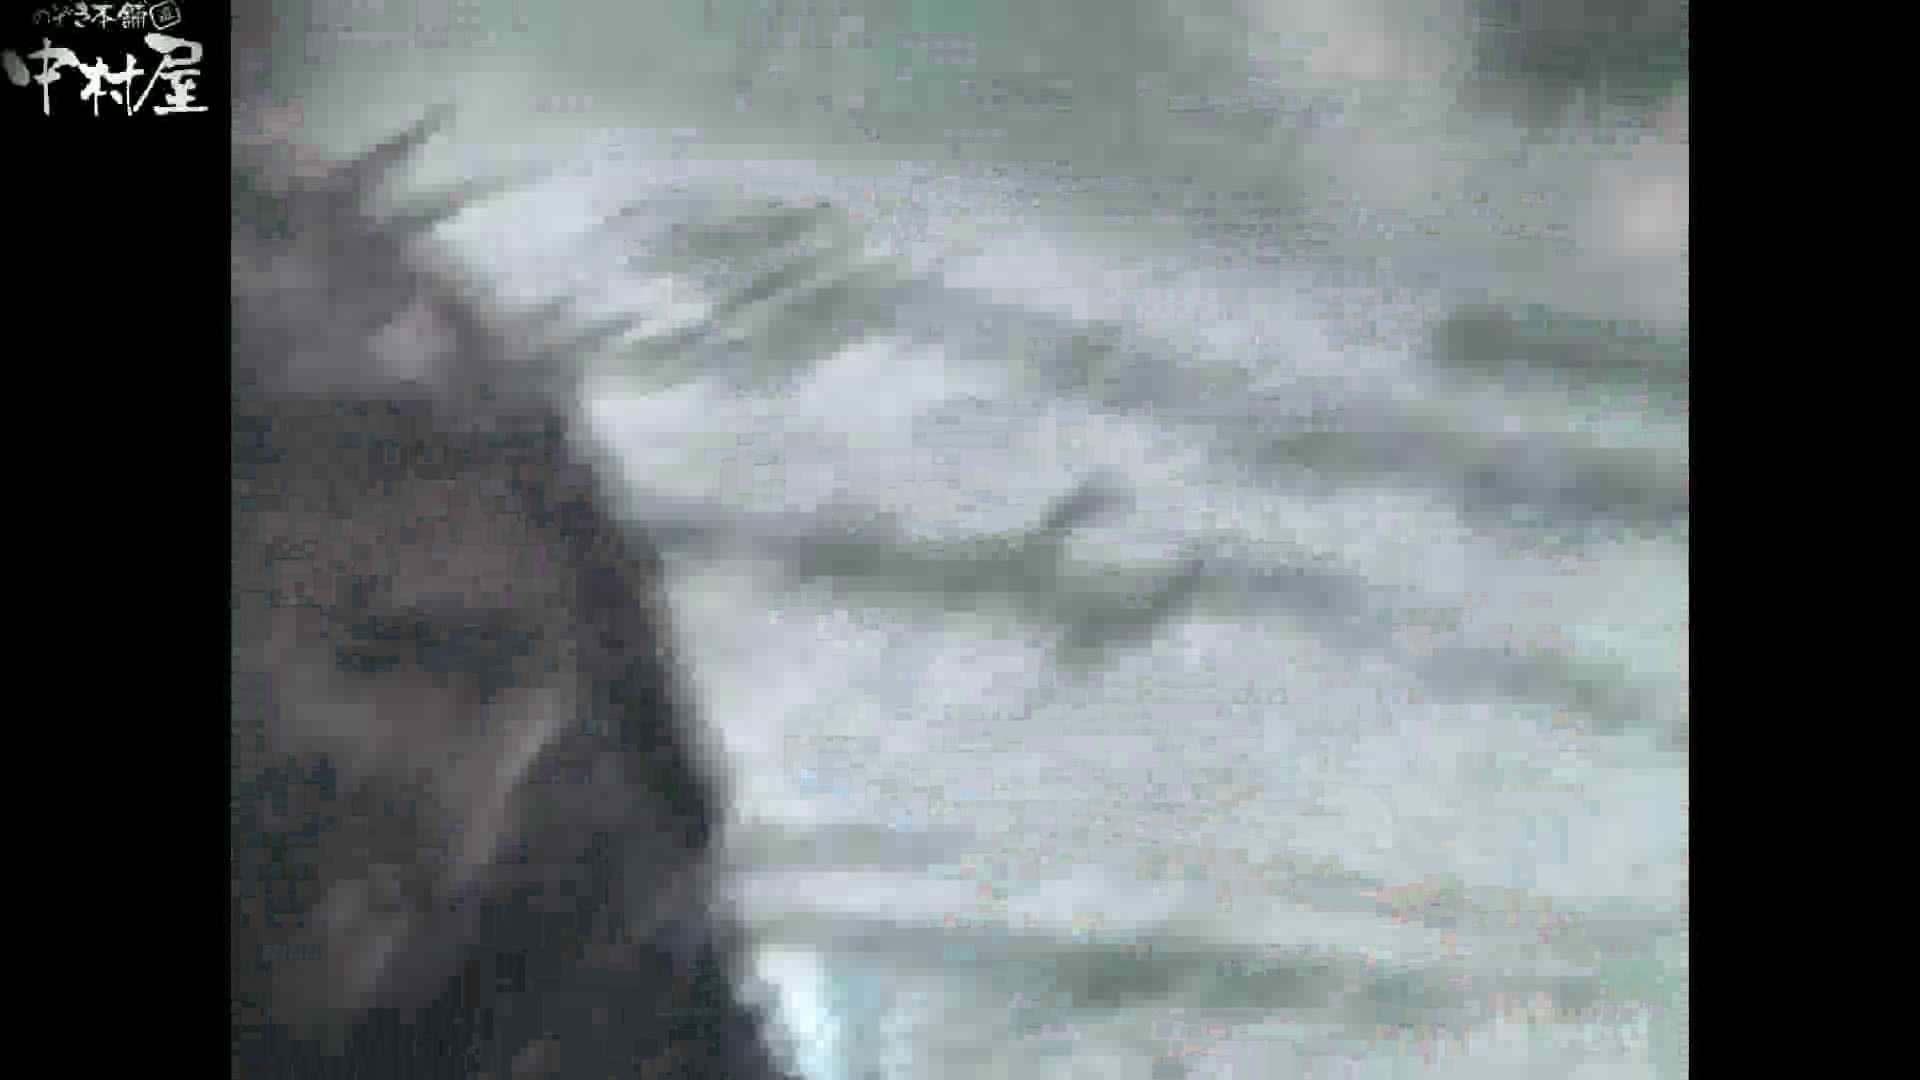 Aquaな露天風呂Vol.867潜入盗撮露天風呂参判湯 其の八 盗撮 AV無料 56画像 2